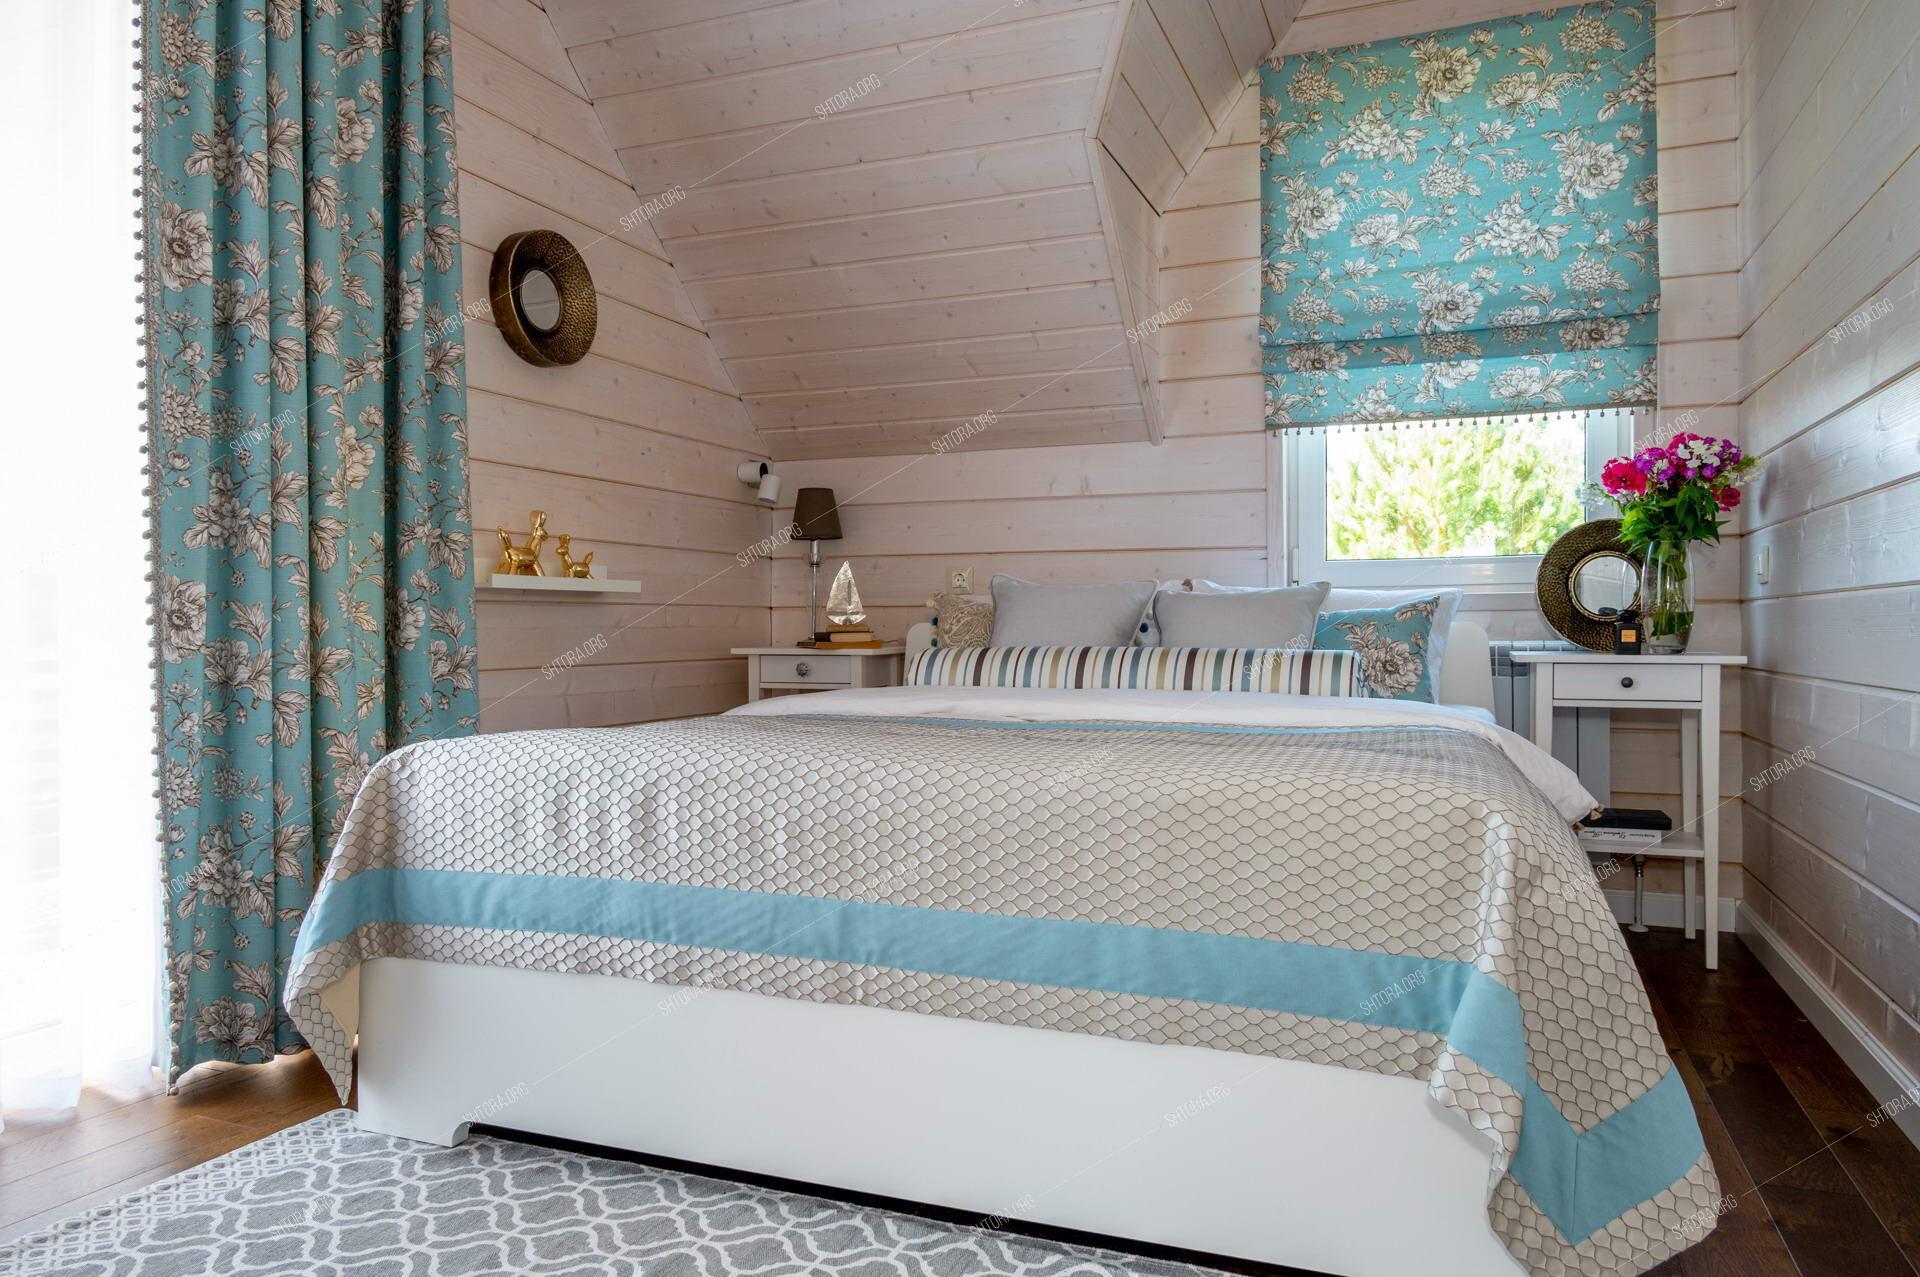 Текстиль в спальню загородного дома.